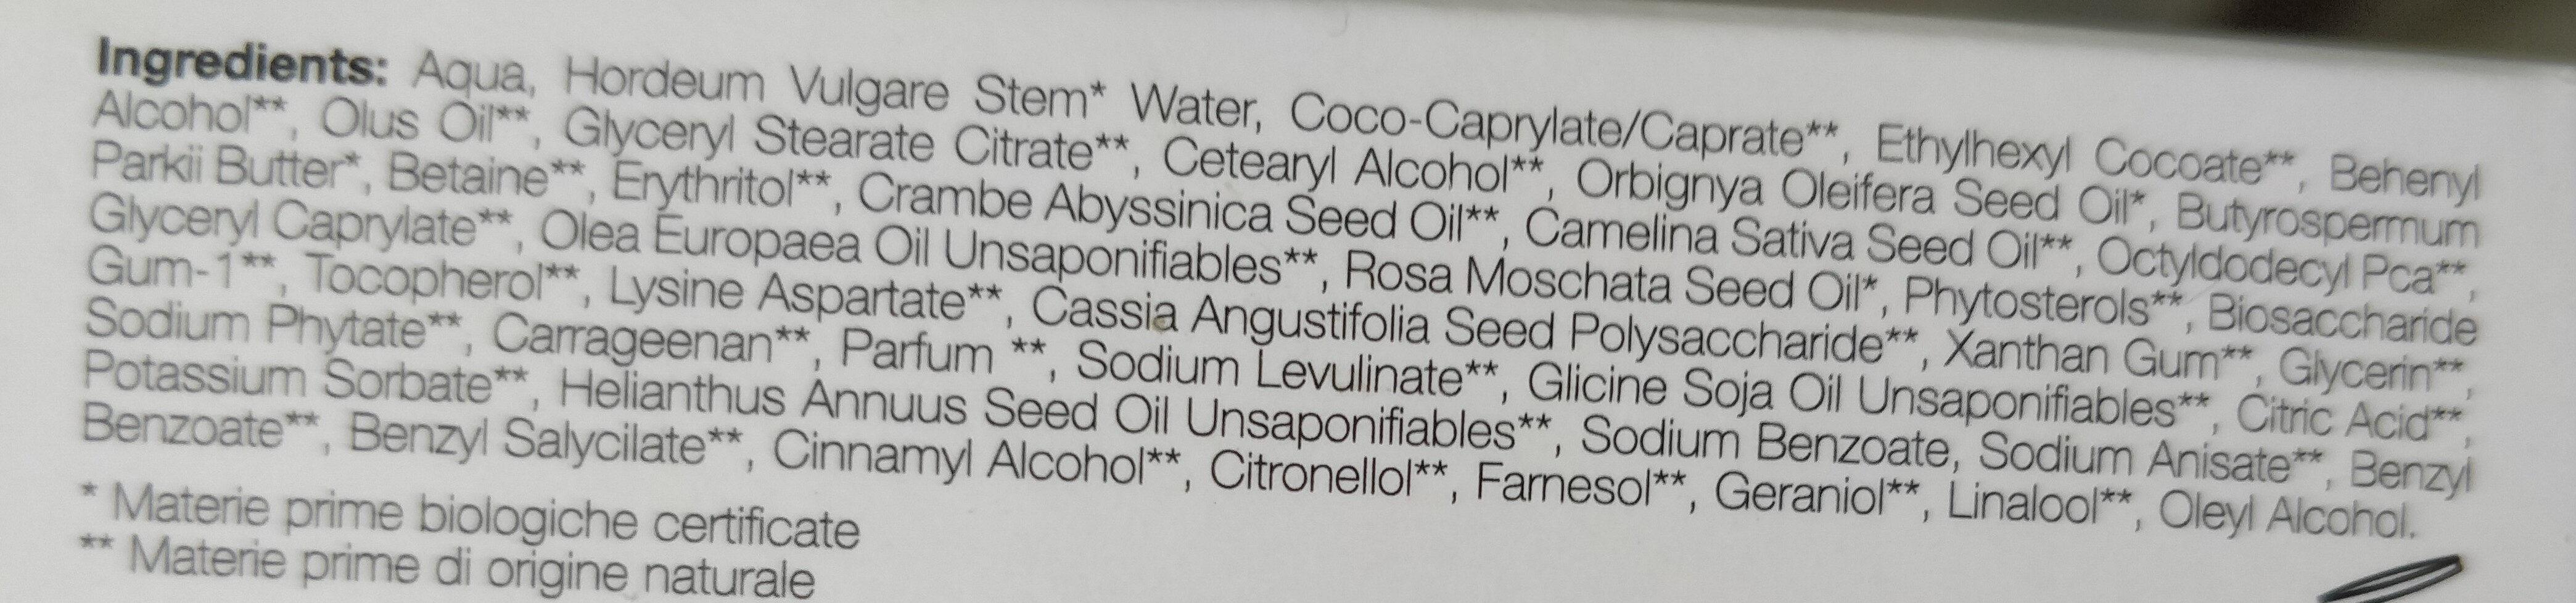 Crema viso 24 h biologica nutriente - Ingrédients - it